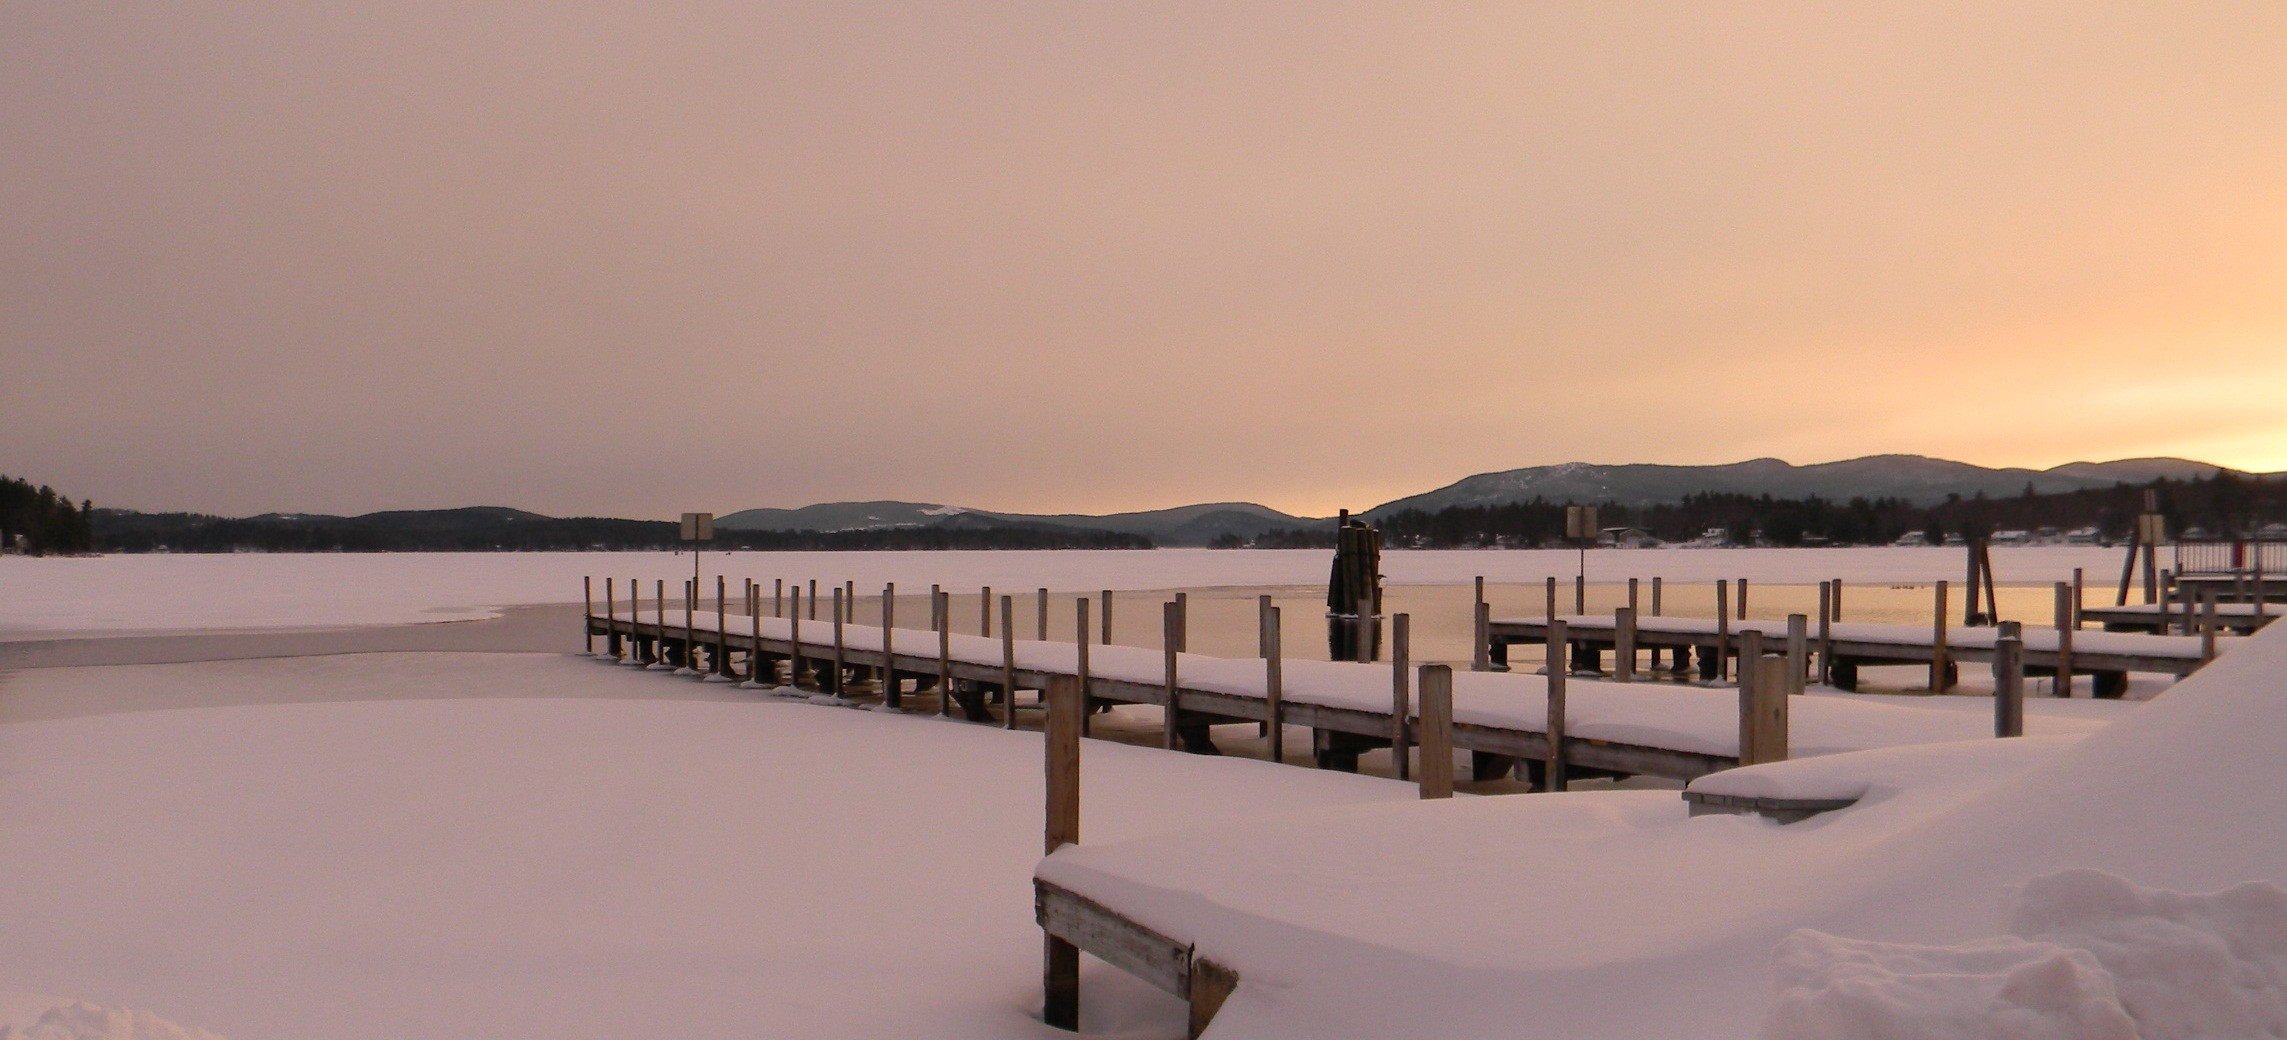 winter wolfeboro bay